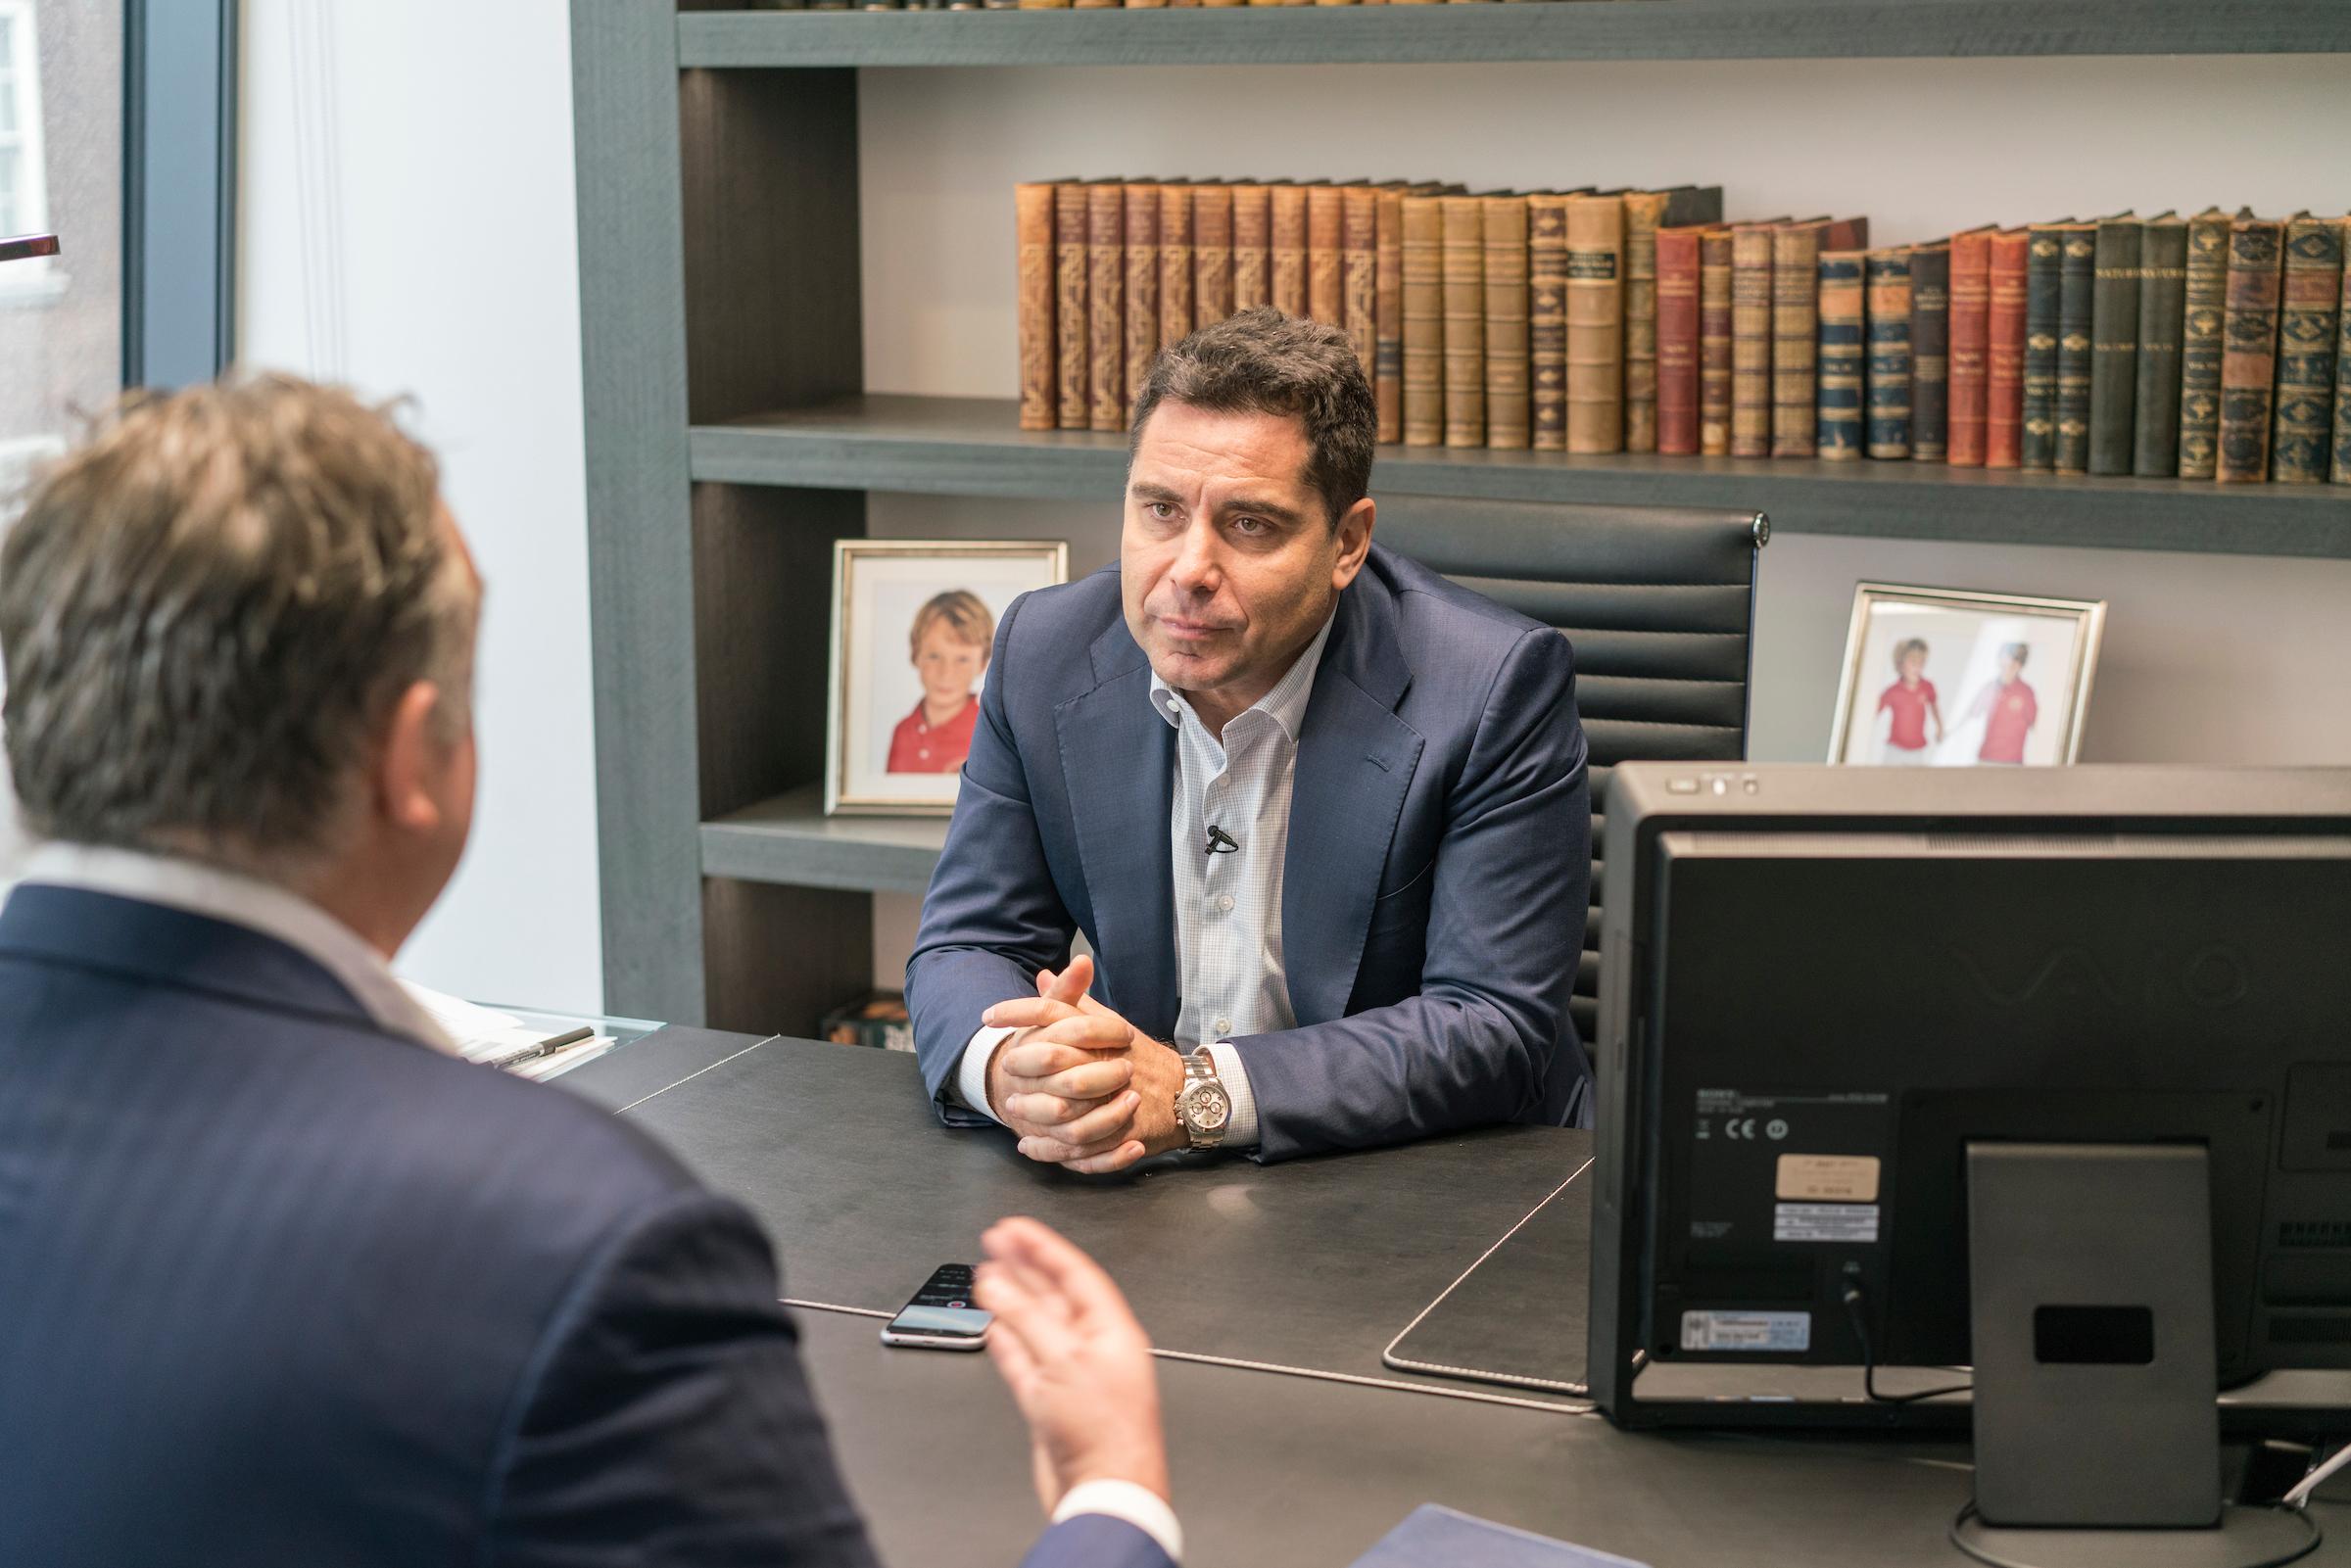 Riccardo Silva being interviewed by Gabriele Marcotti